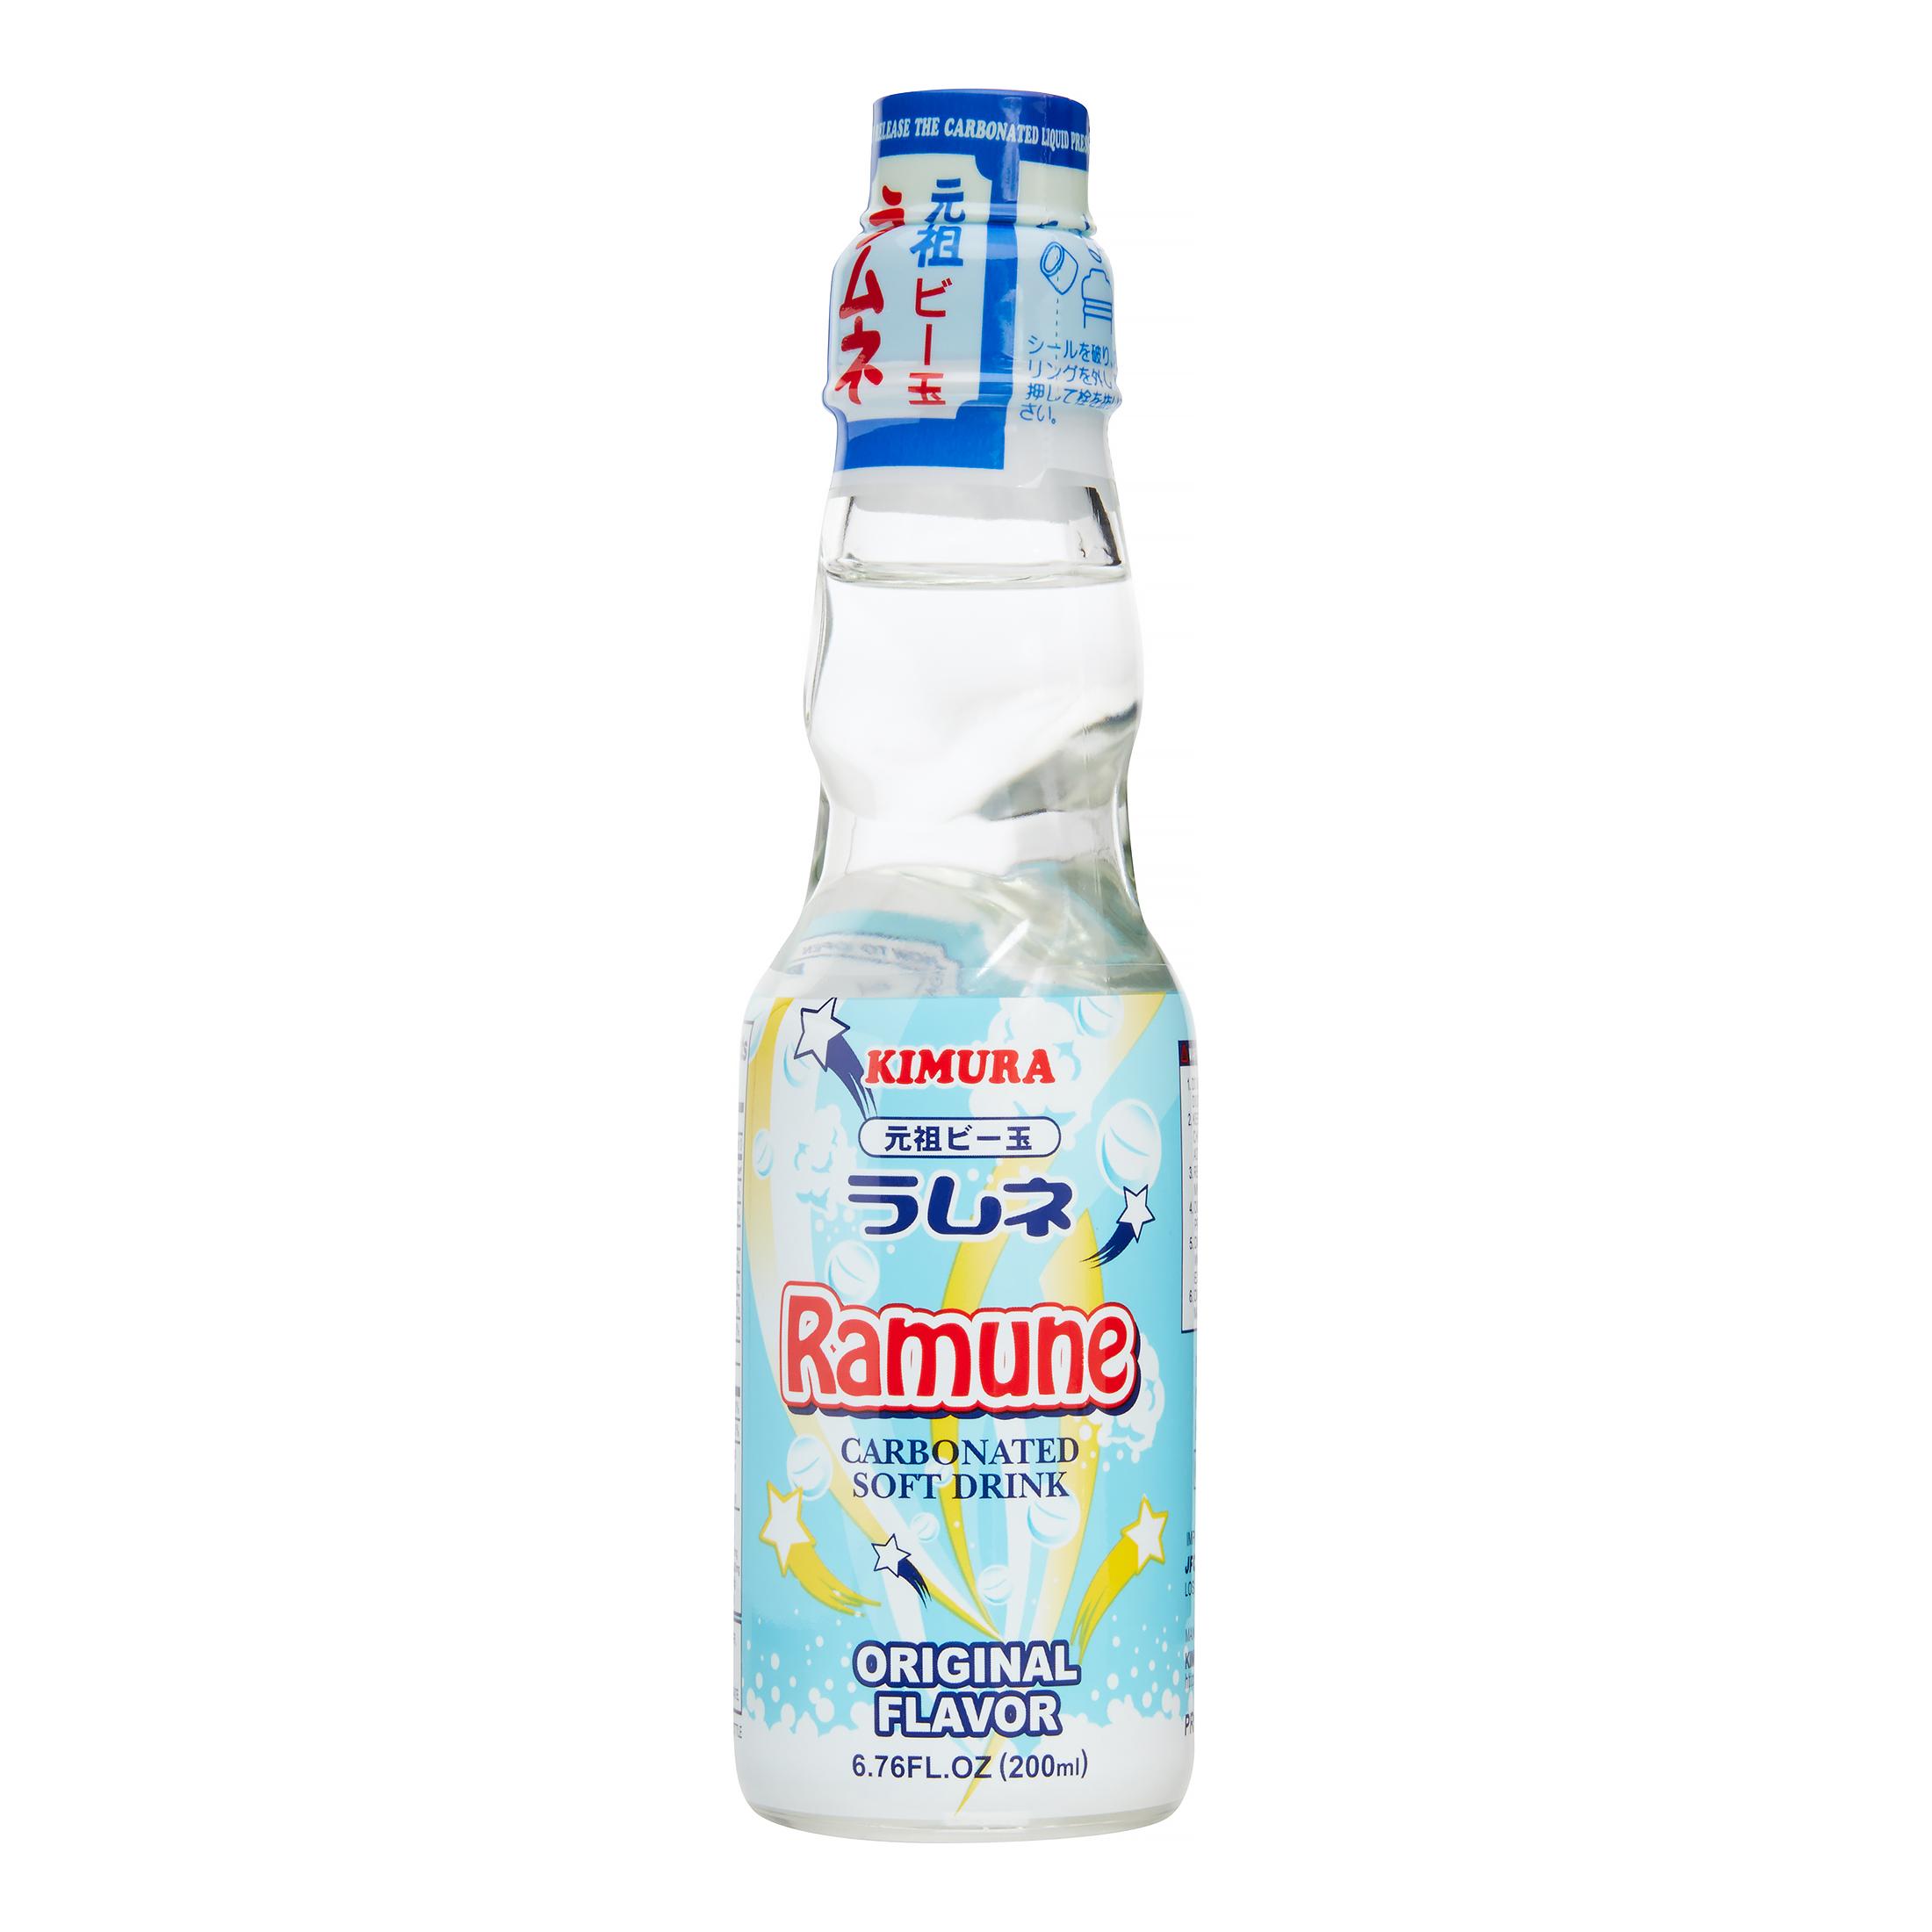 KIMURA Ramune Carbonated Soft Drink Original Flavor 6.76 oz